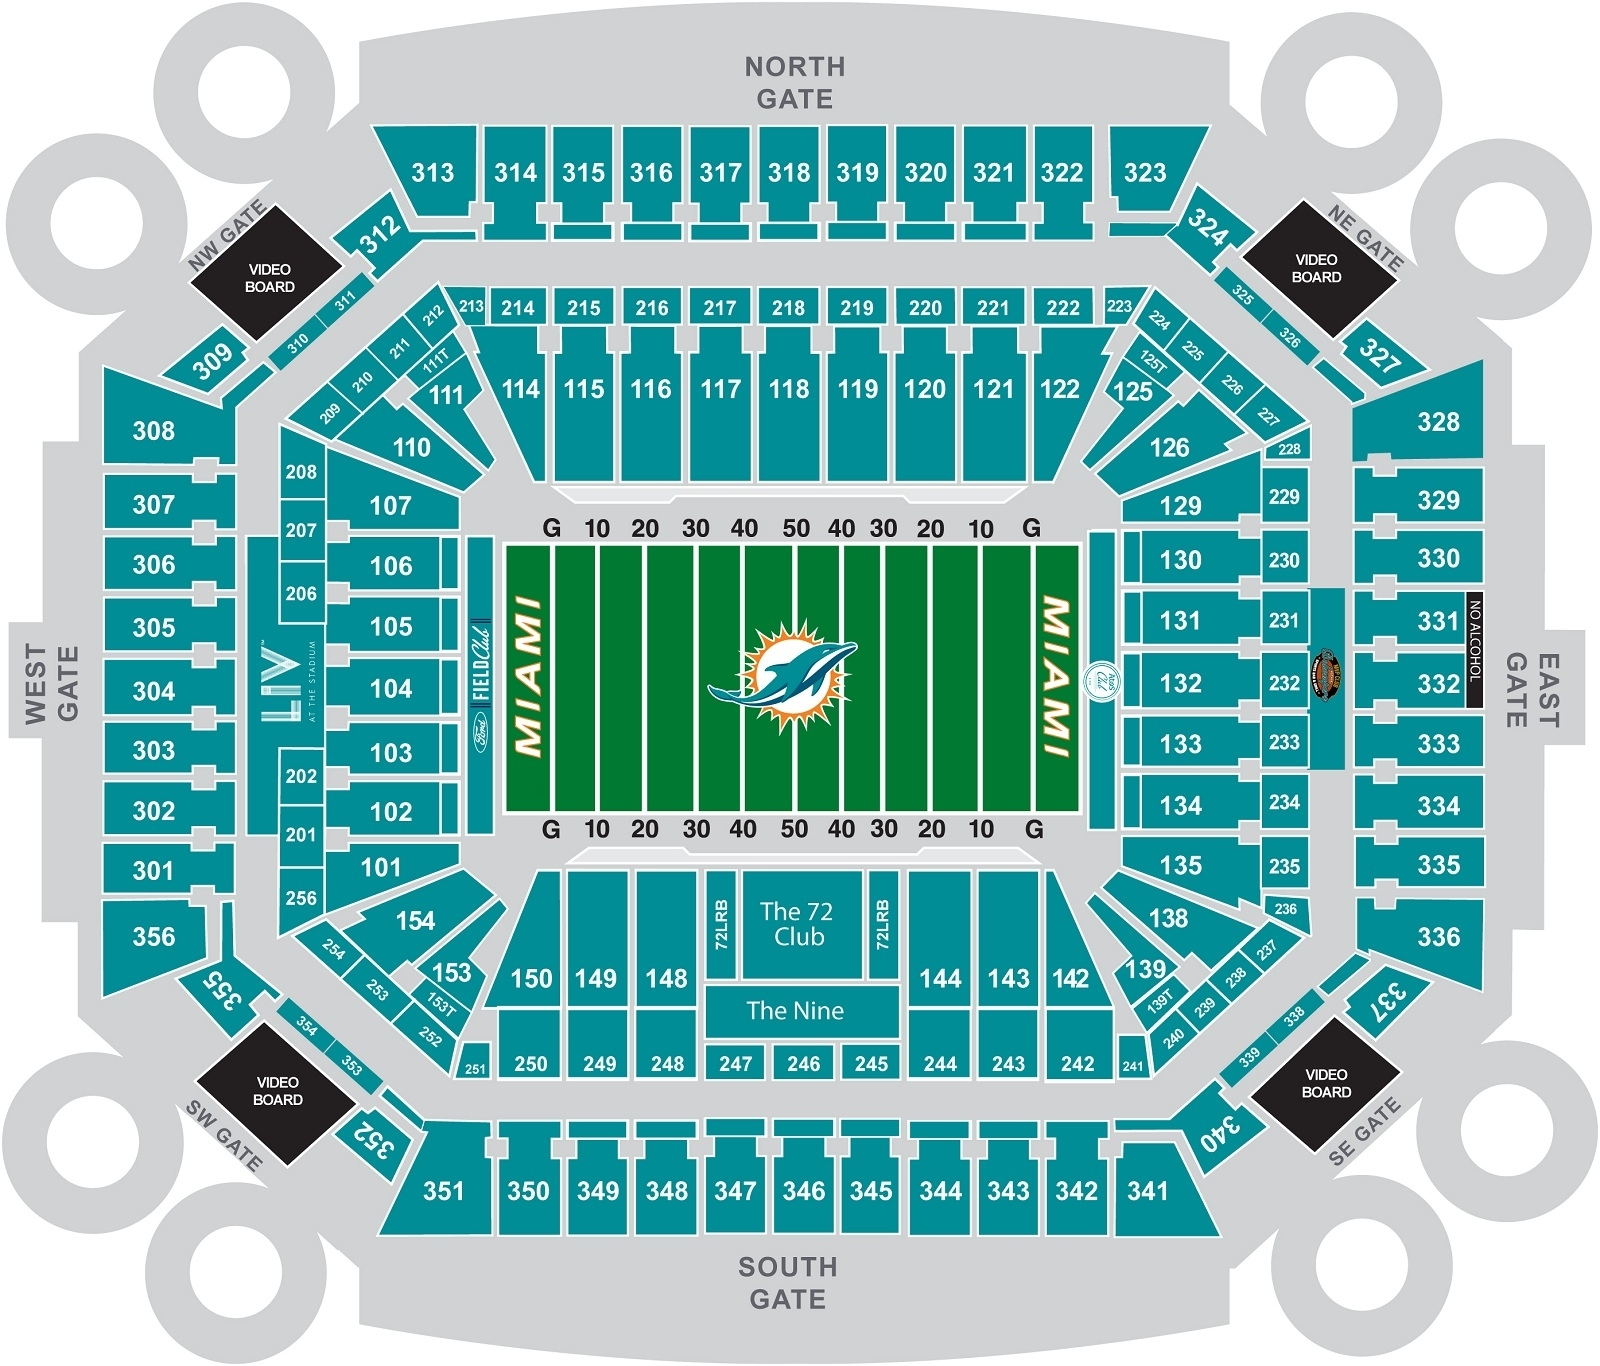 2020 Super Bowl Seating Chart | February 2, 2020 | Fan regarding Seating Chart For Super Bowl